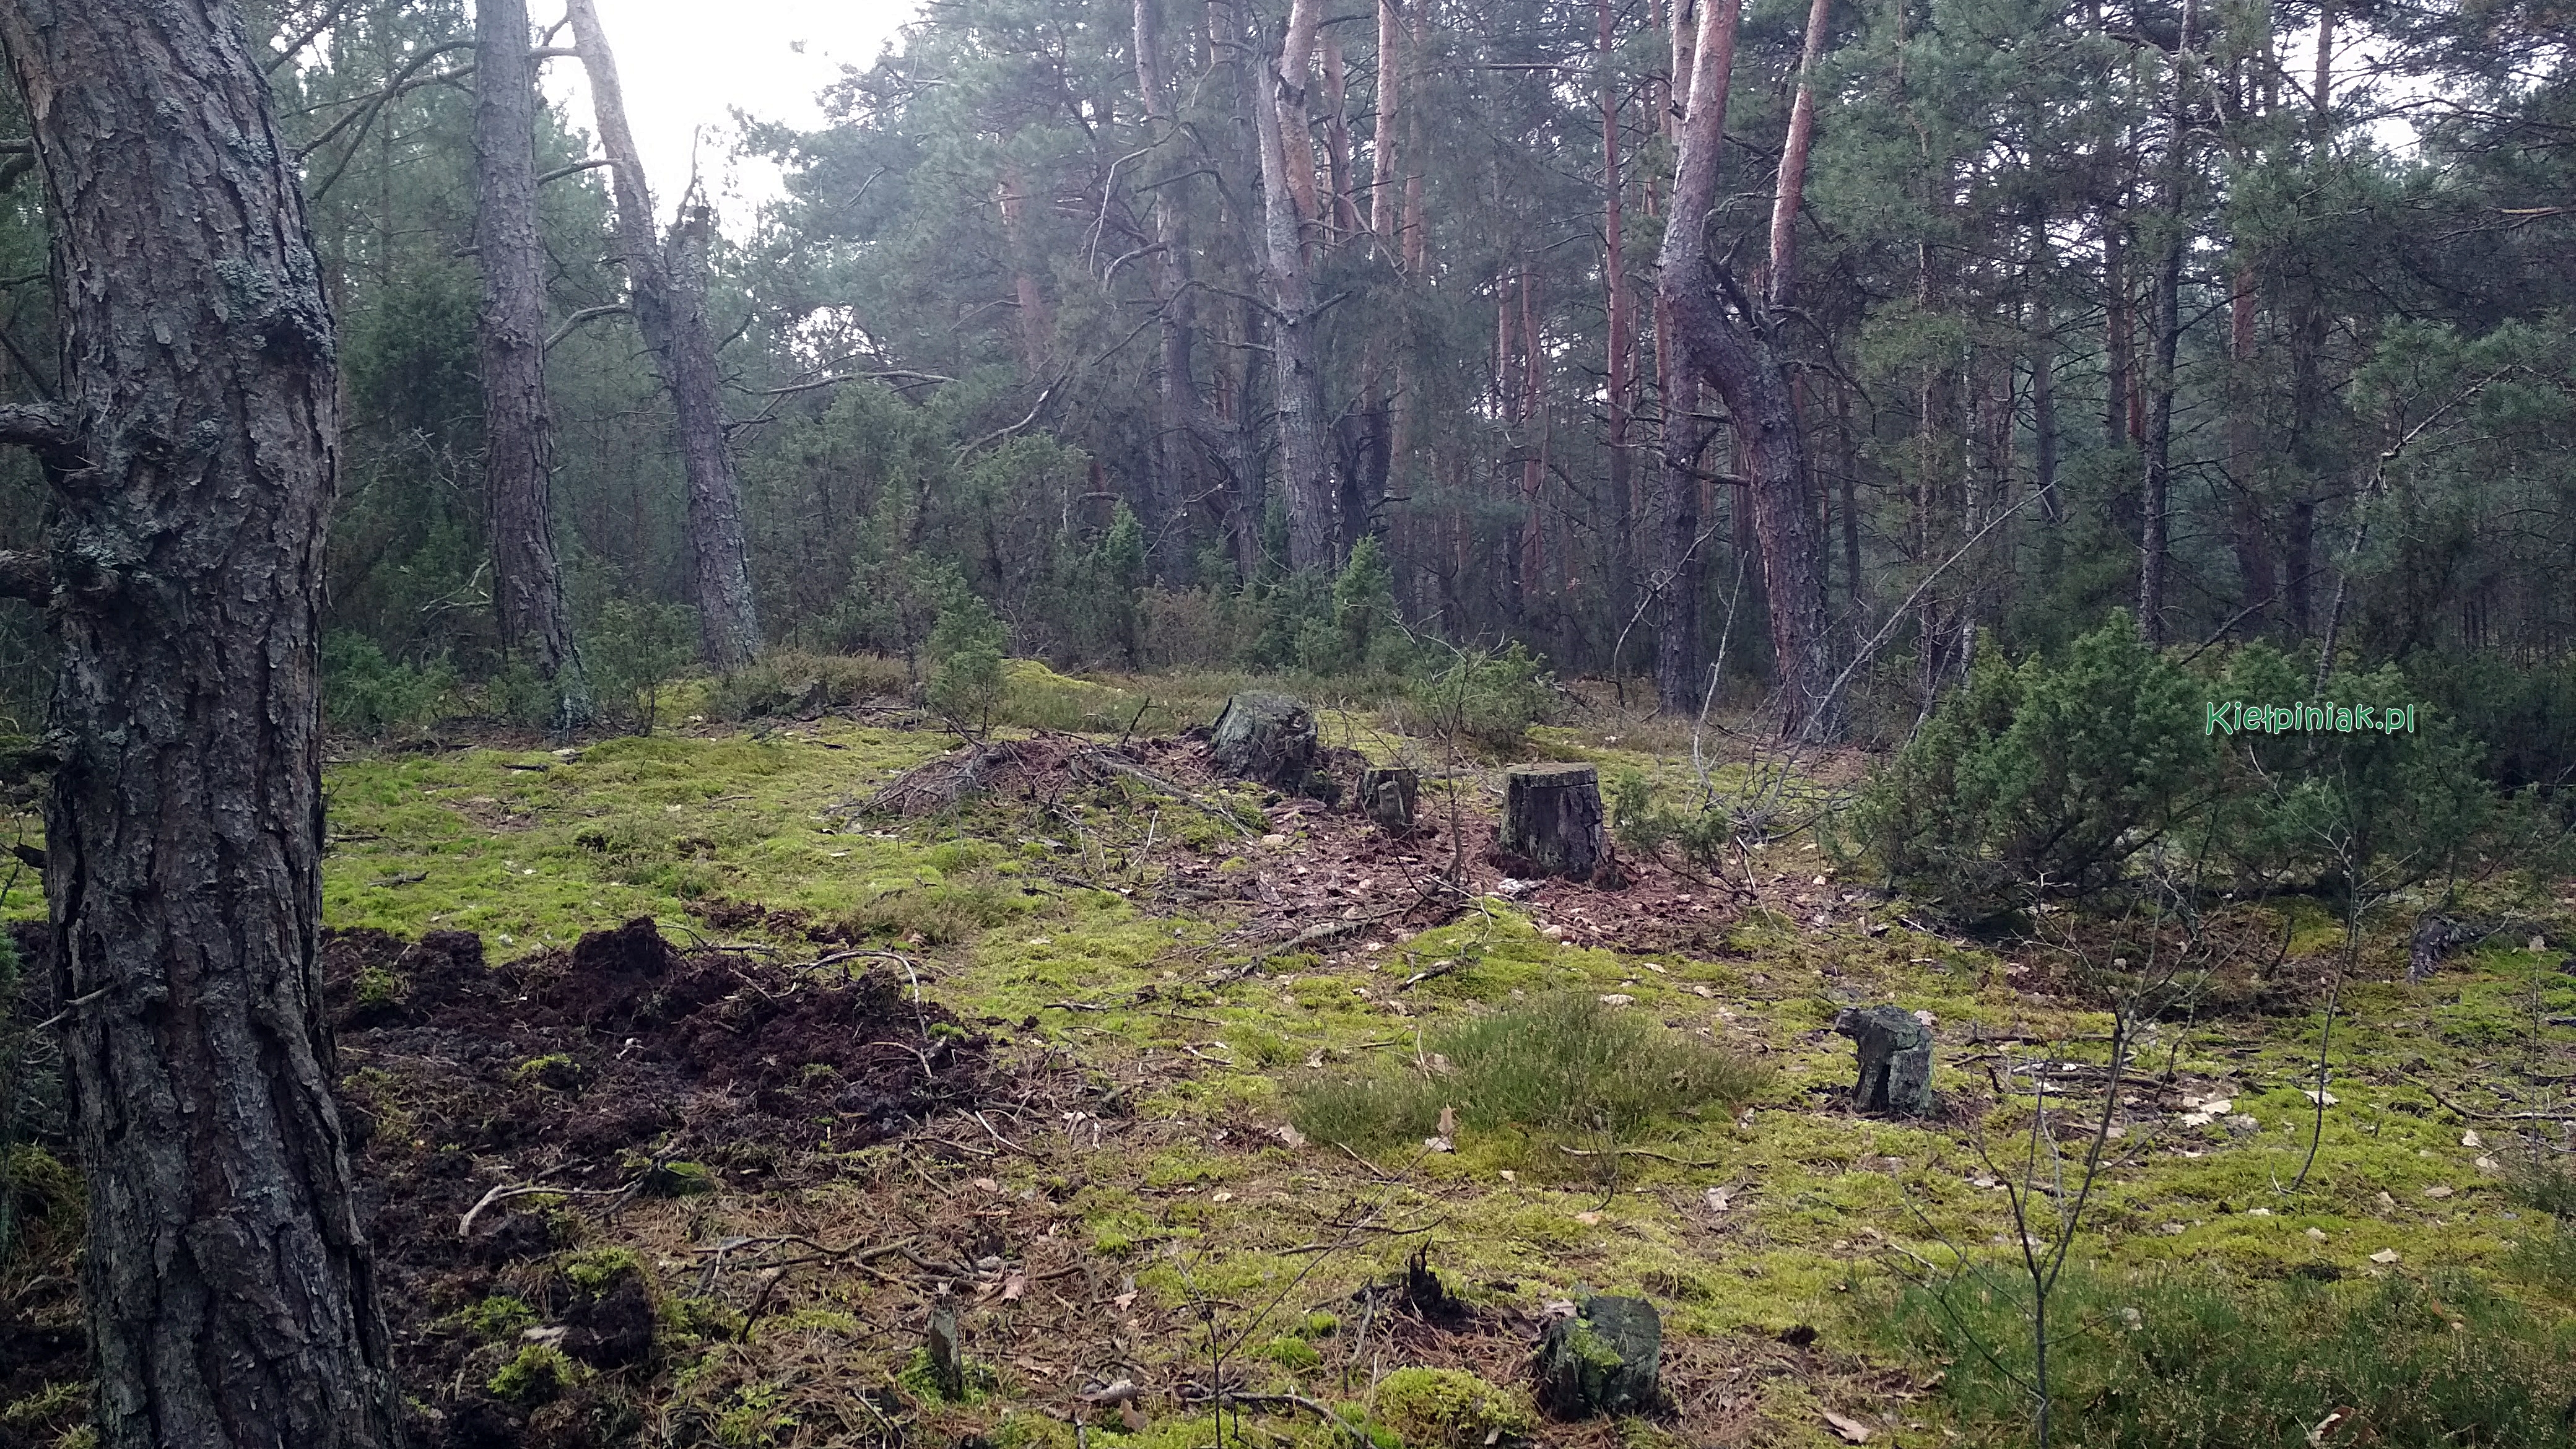 las w okolicy kielpinca